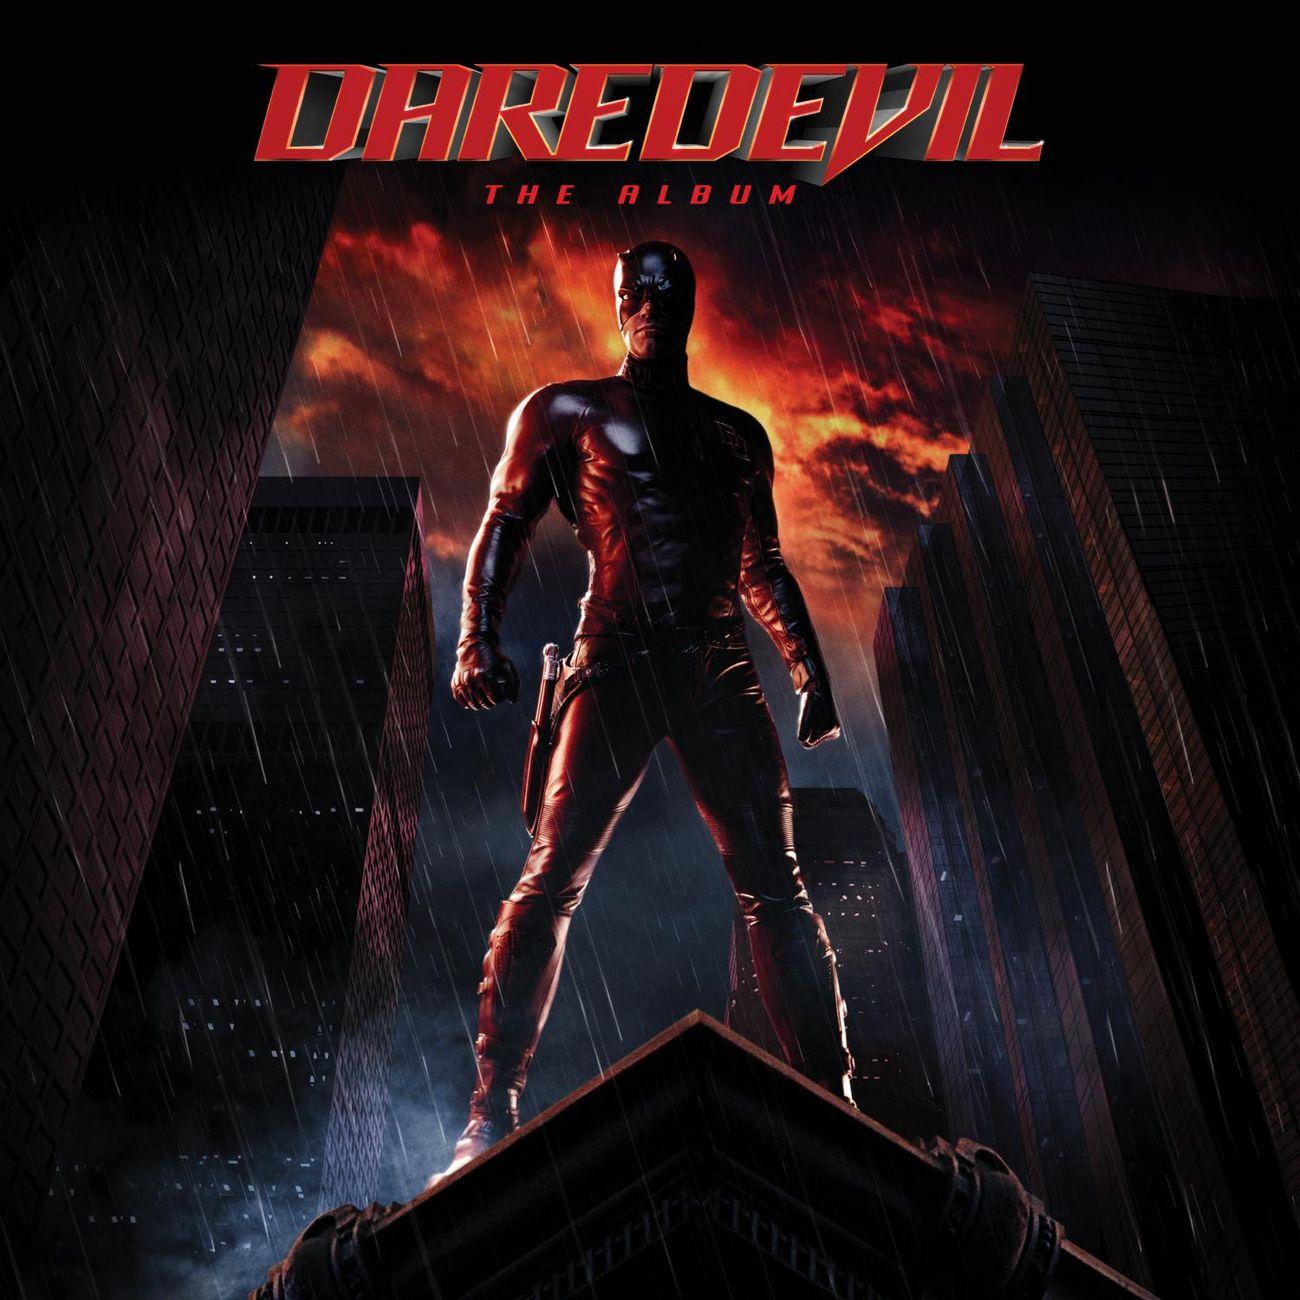 Daredevil Soundtrack Evanescence Wiki Fandom Powered